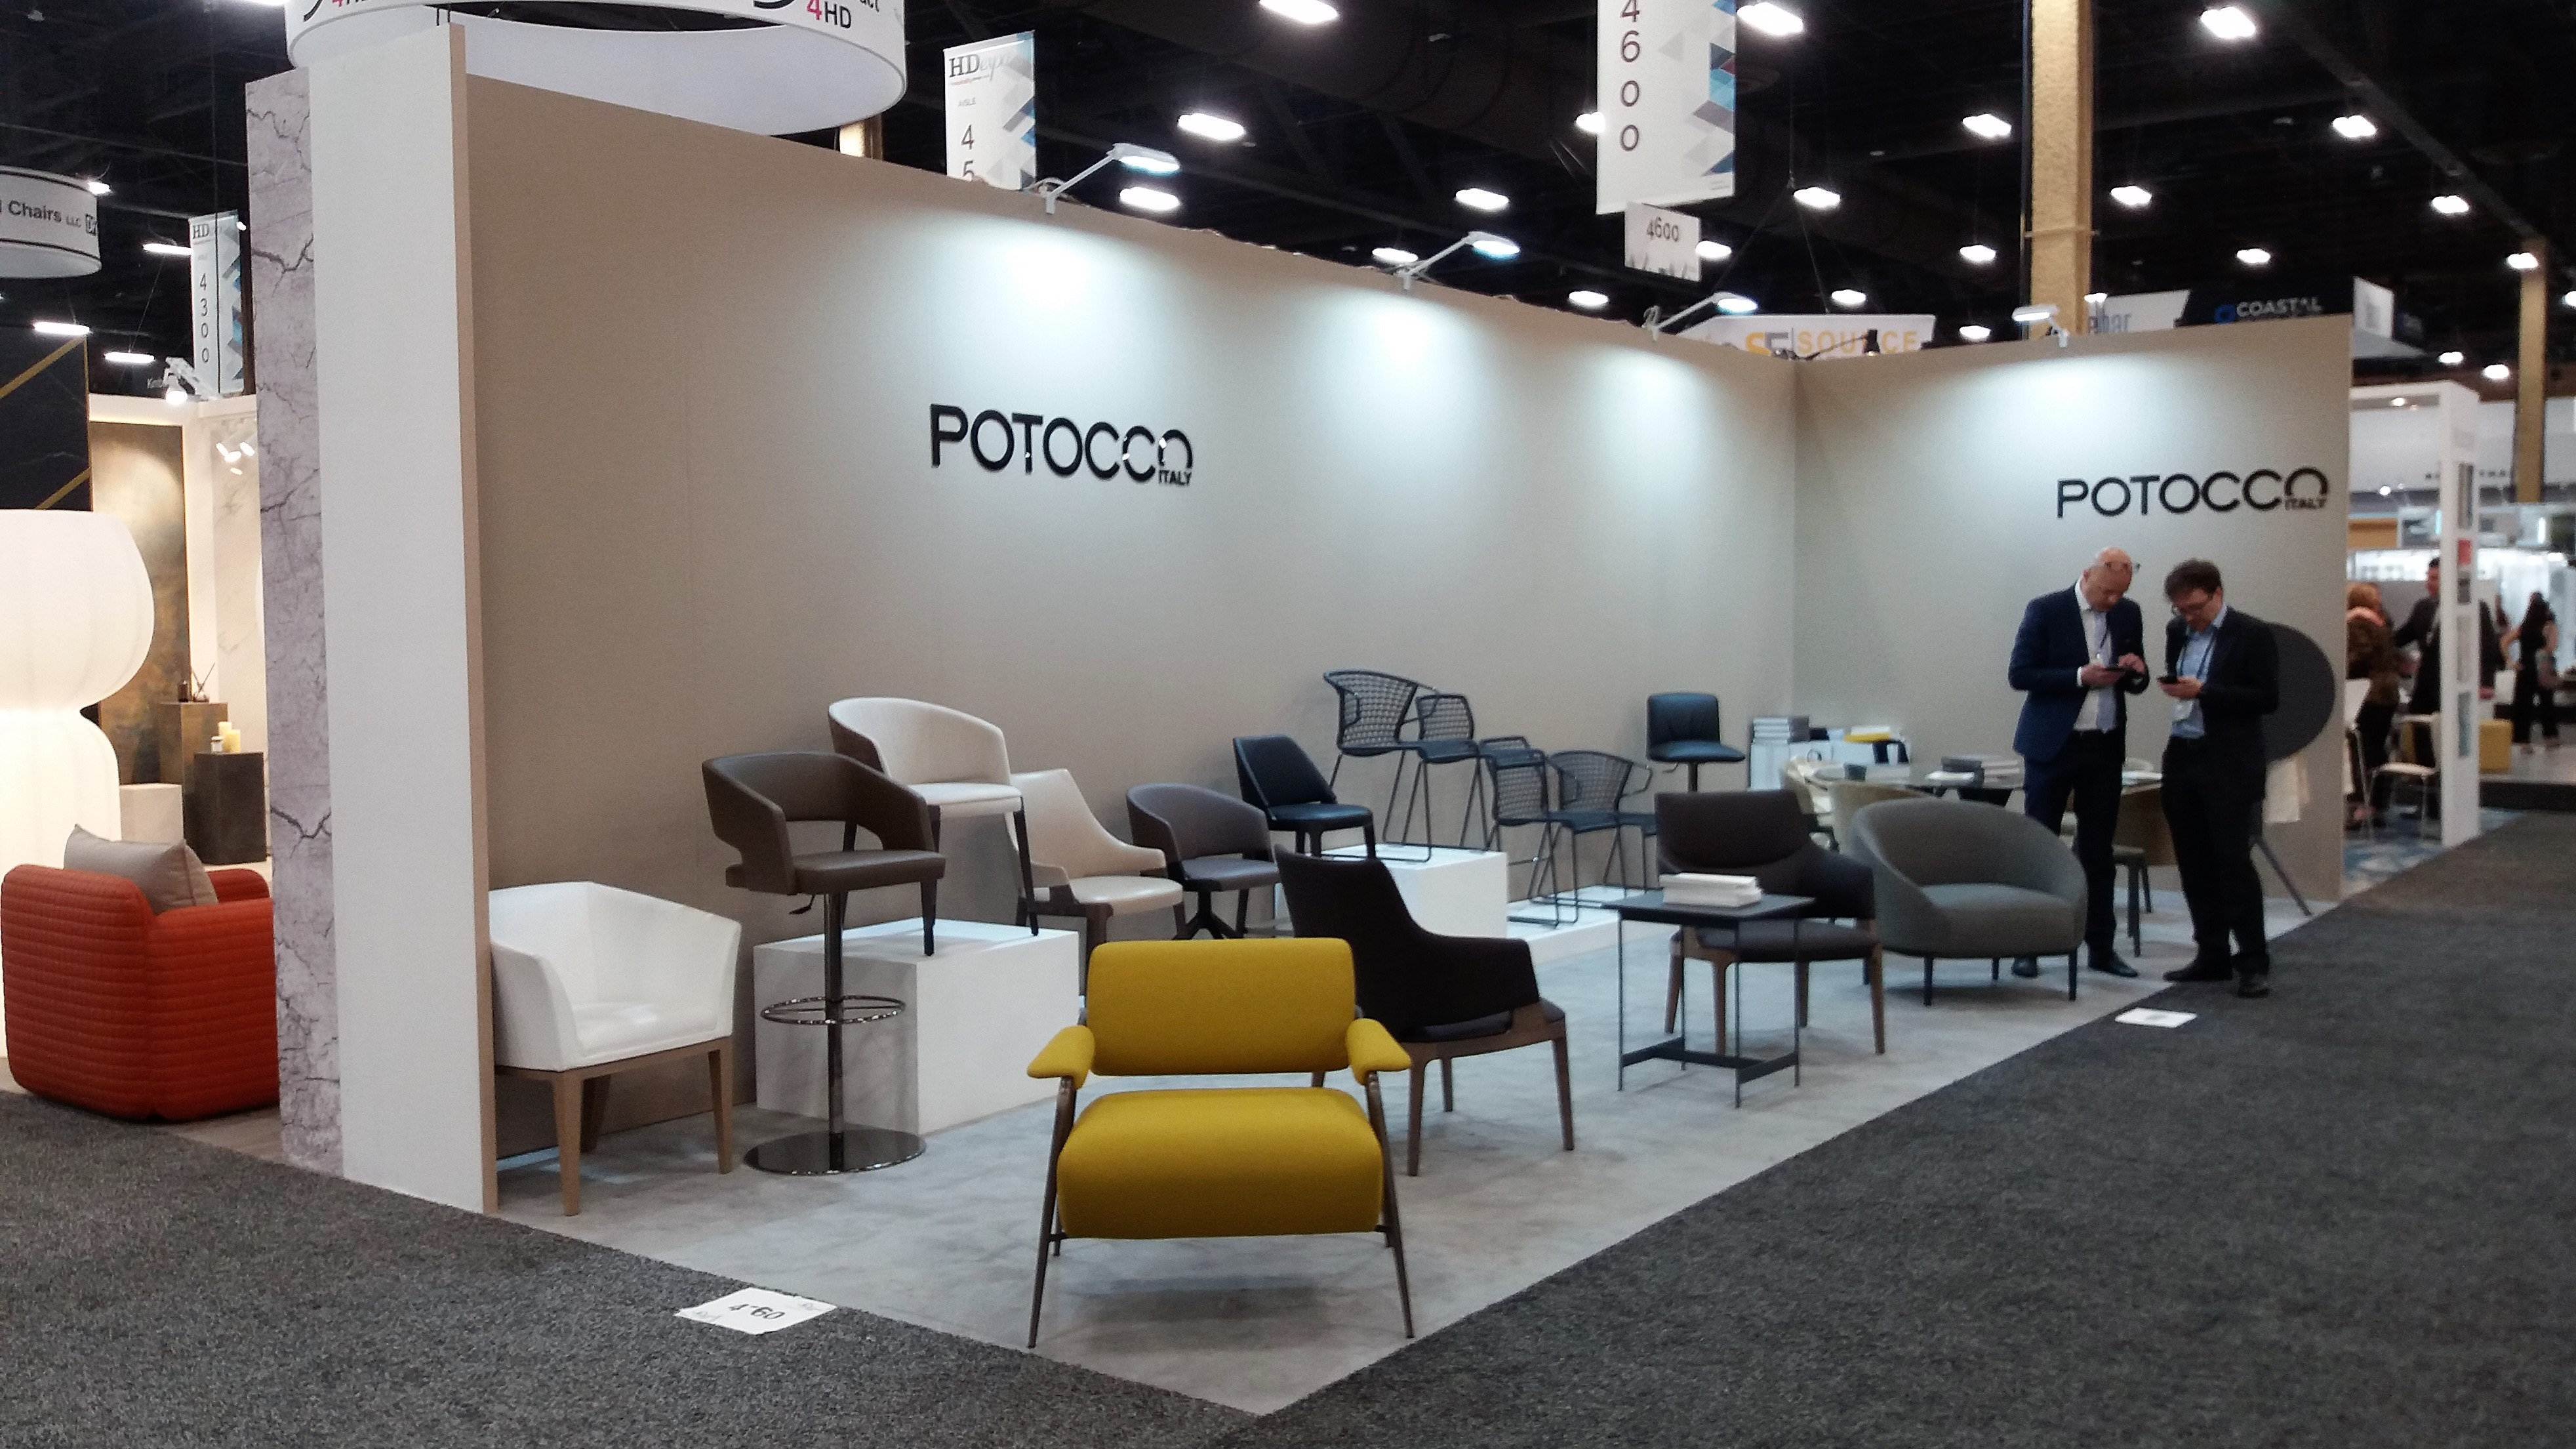 Hospitality Design Expo - POTOCCO